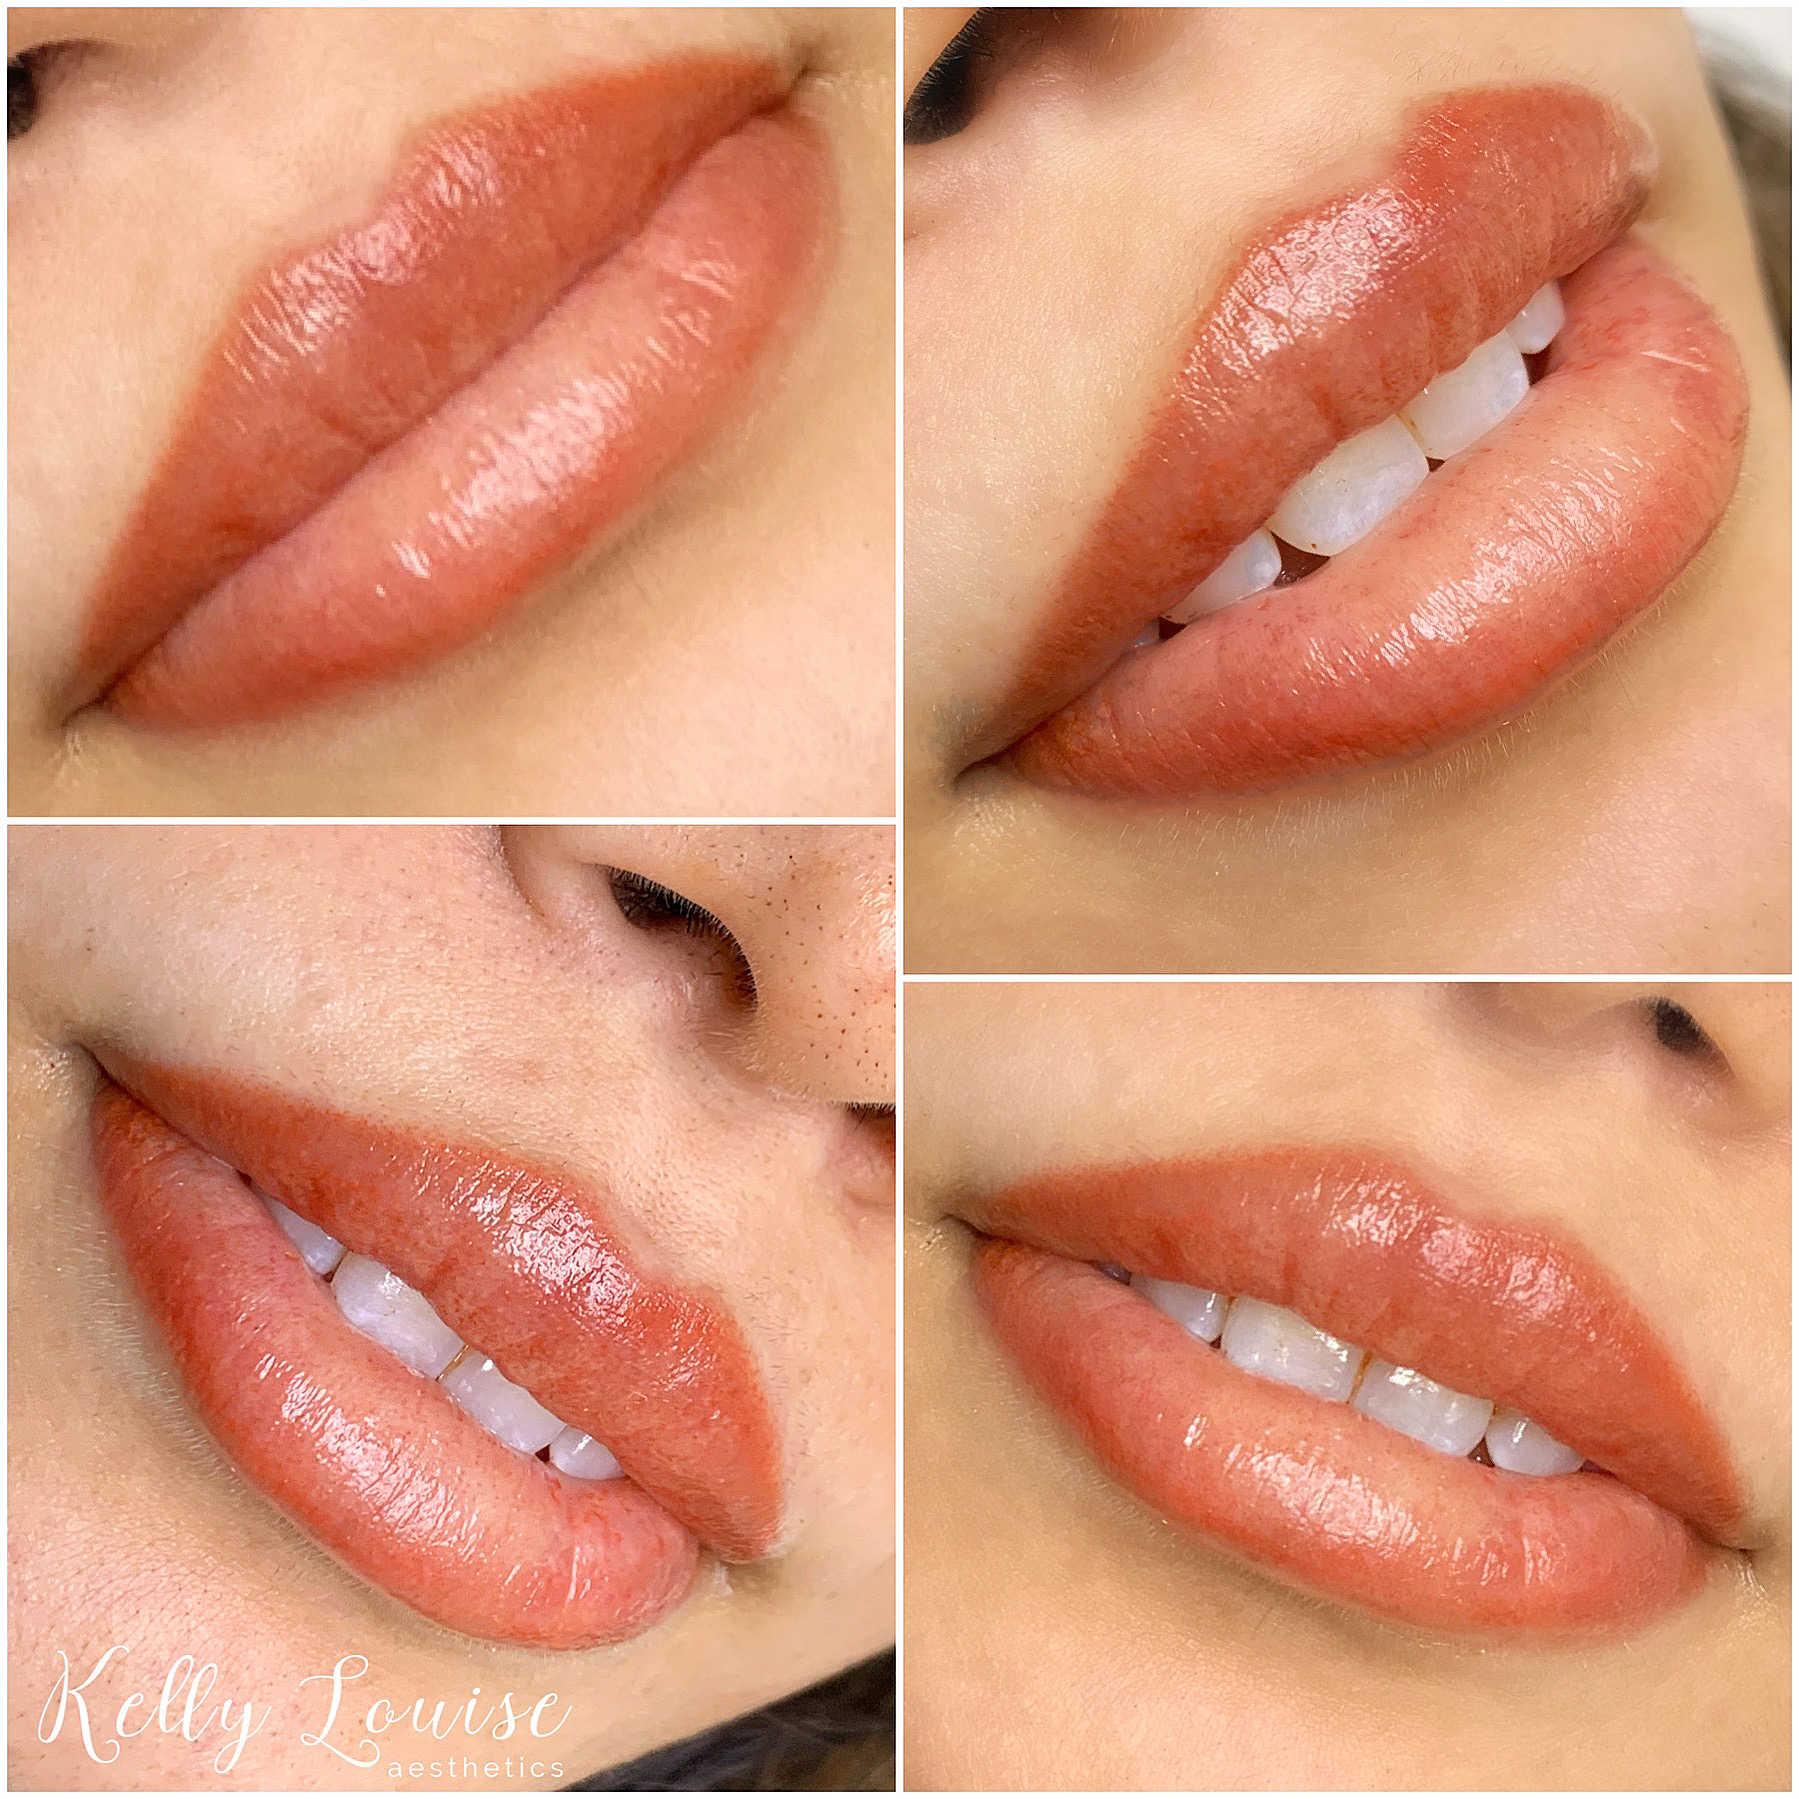 Full lips at Kelly Louise Aesthetics